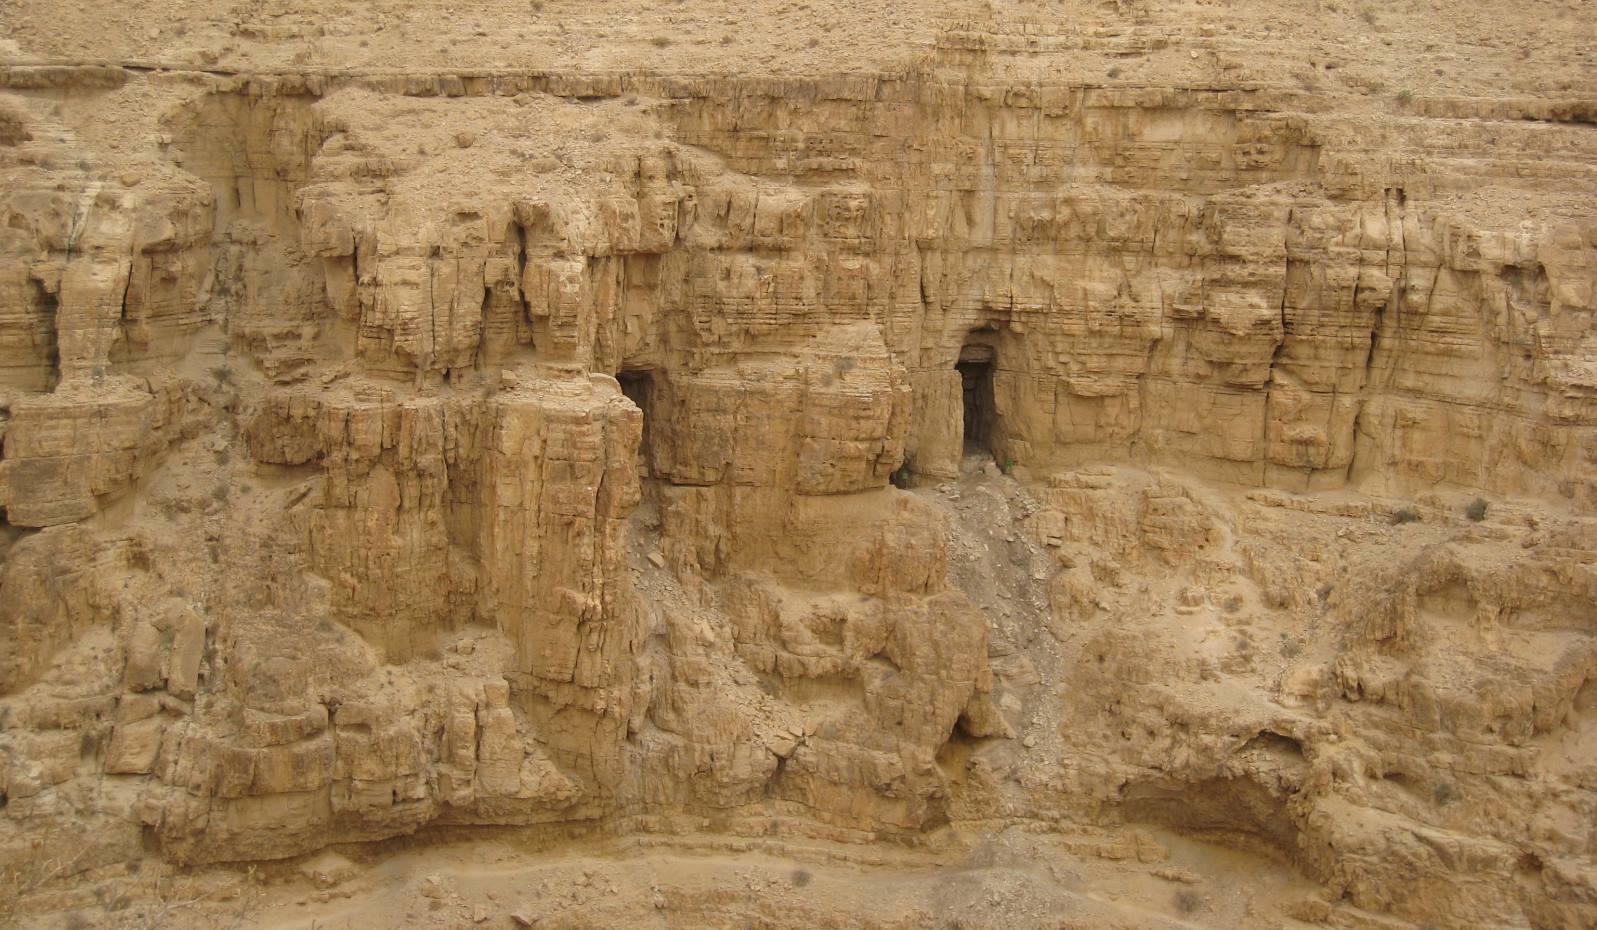 Caves at Nahal Dragot. Photo by Brian Blum